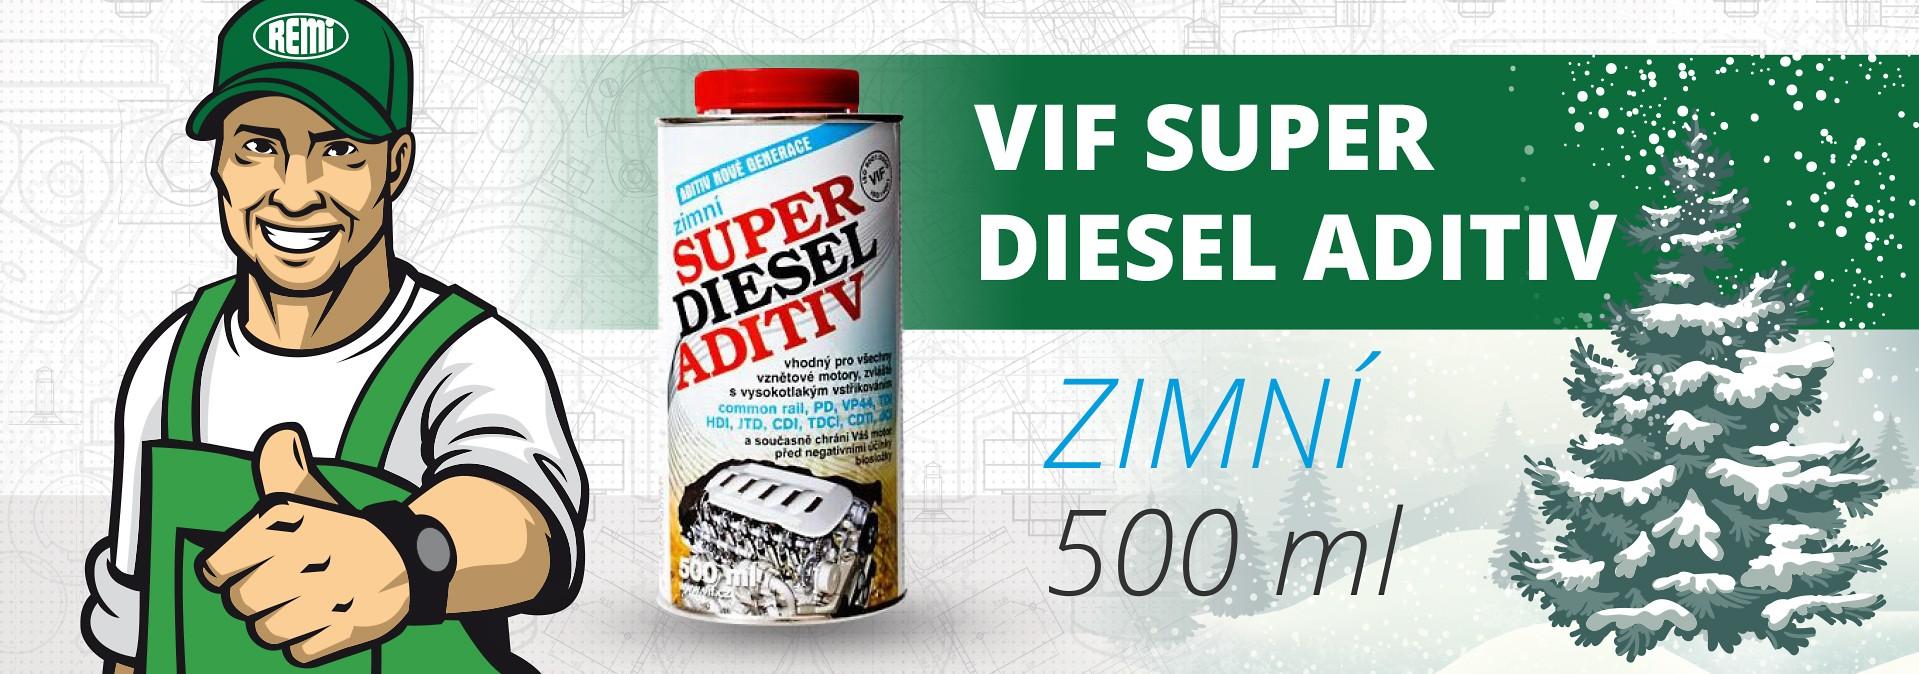 Vif Super Diesel zimní